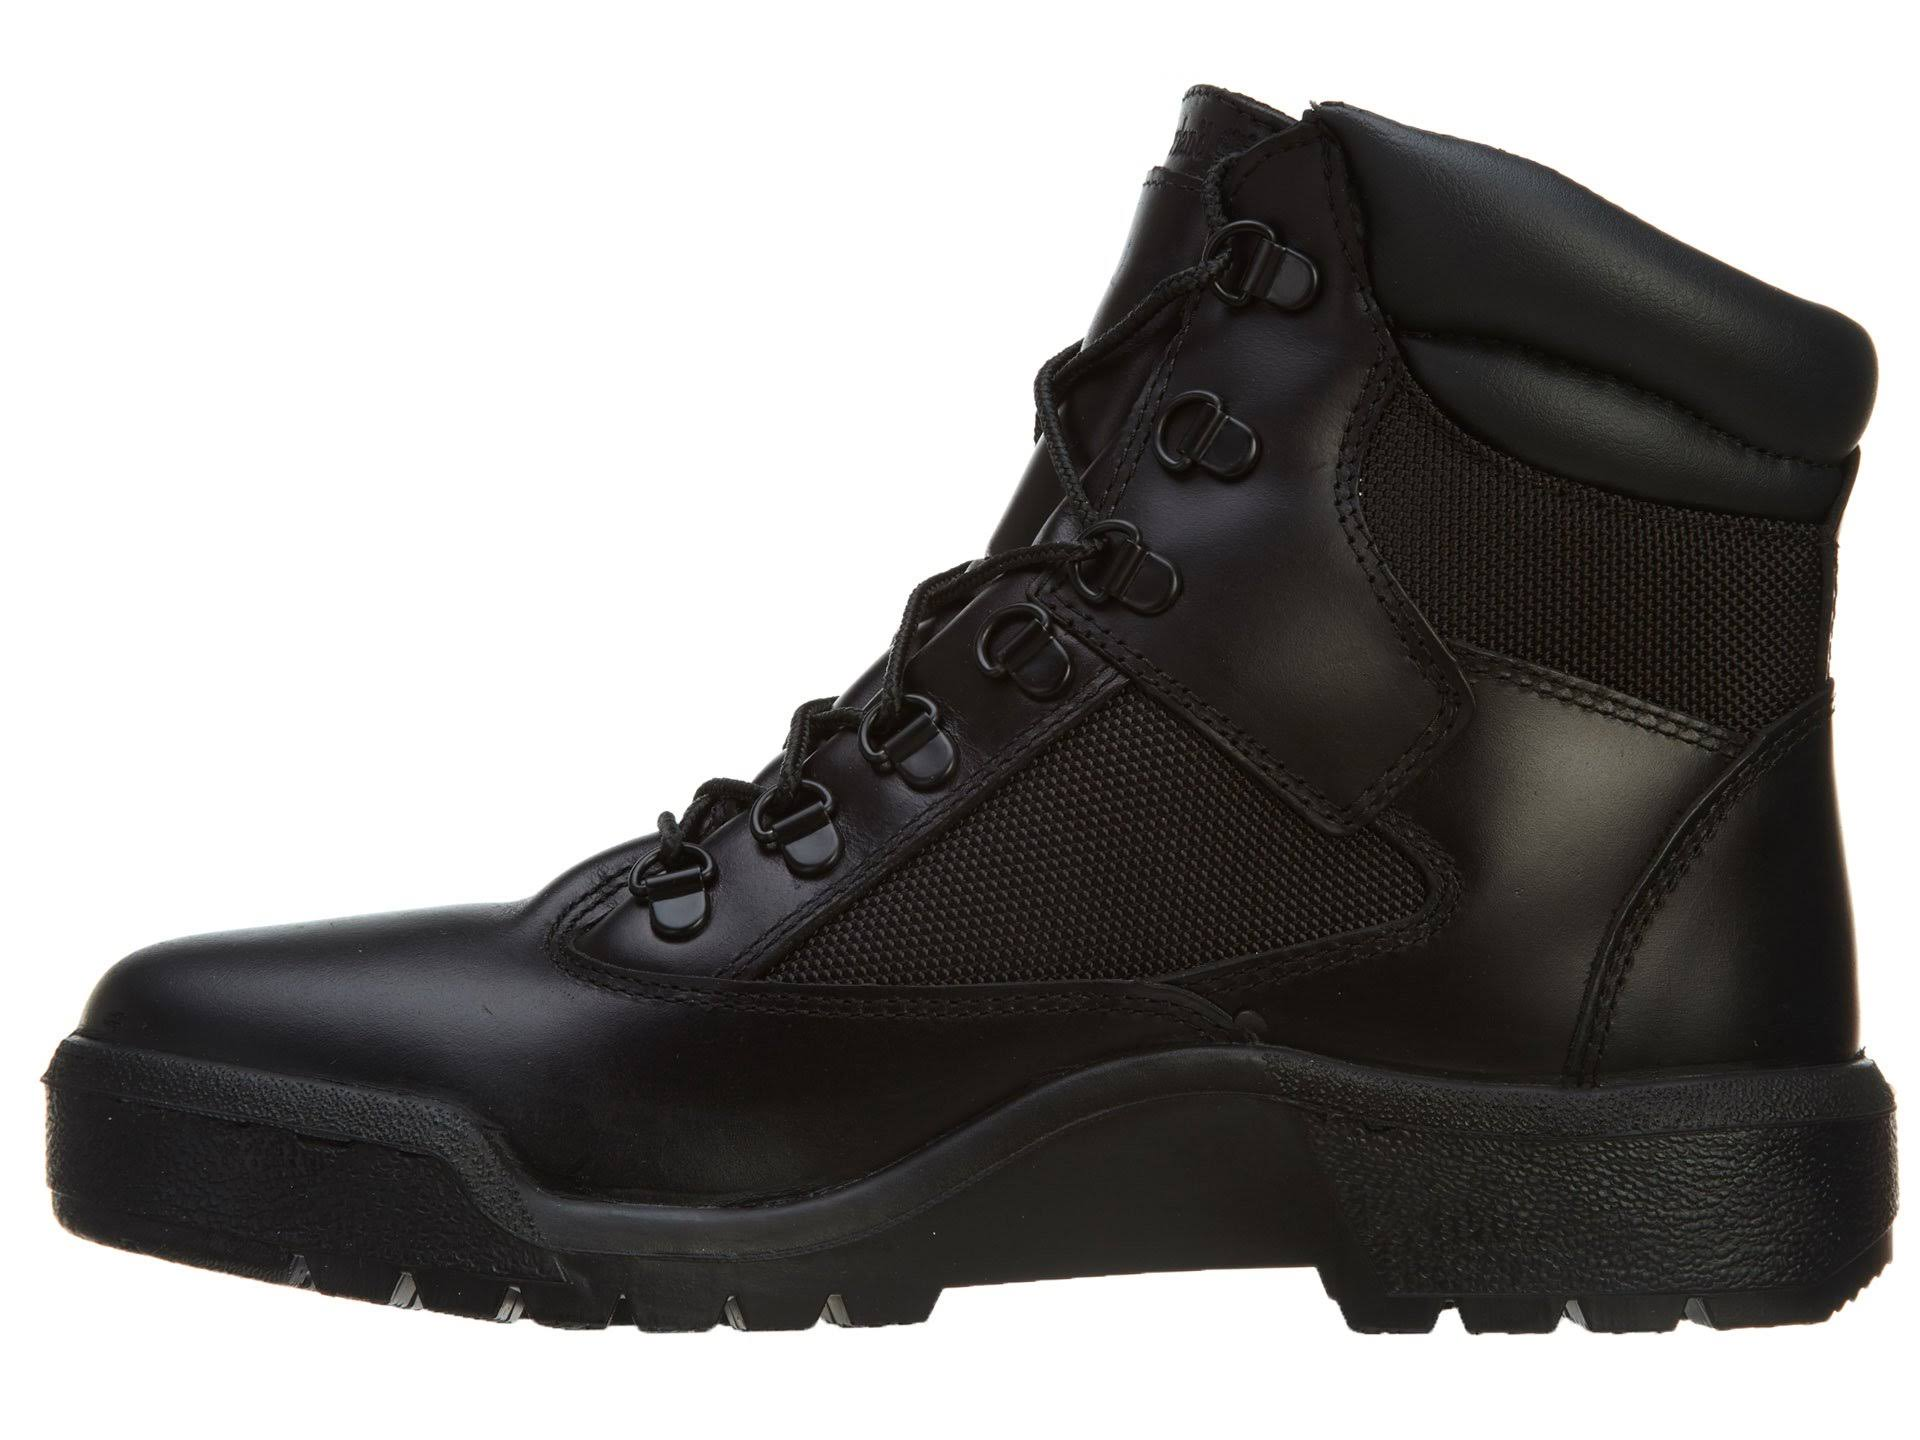 Negro Boot Tb06057b Timberland Field Non Estilo Gtx In Para Hombre 6 vqwvTRrP